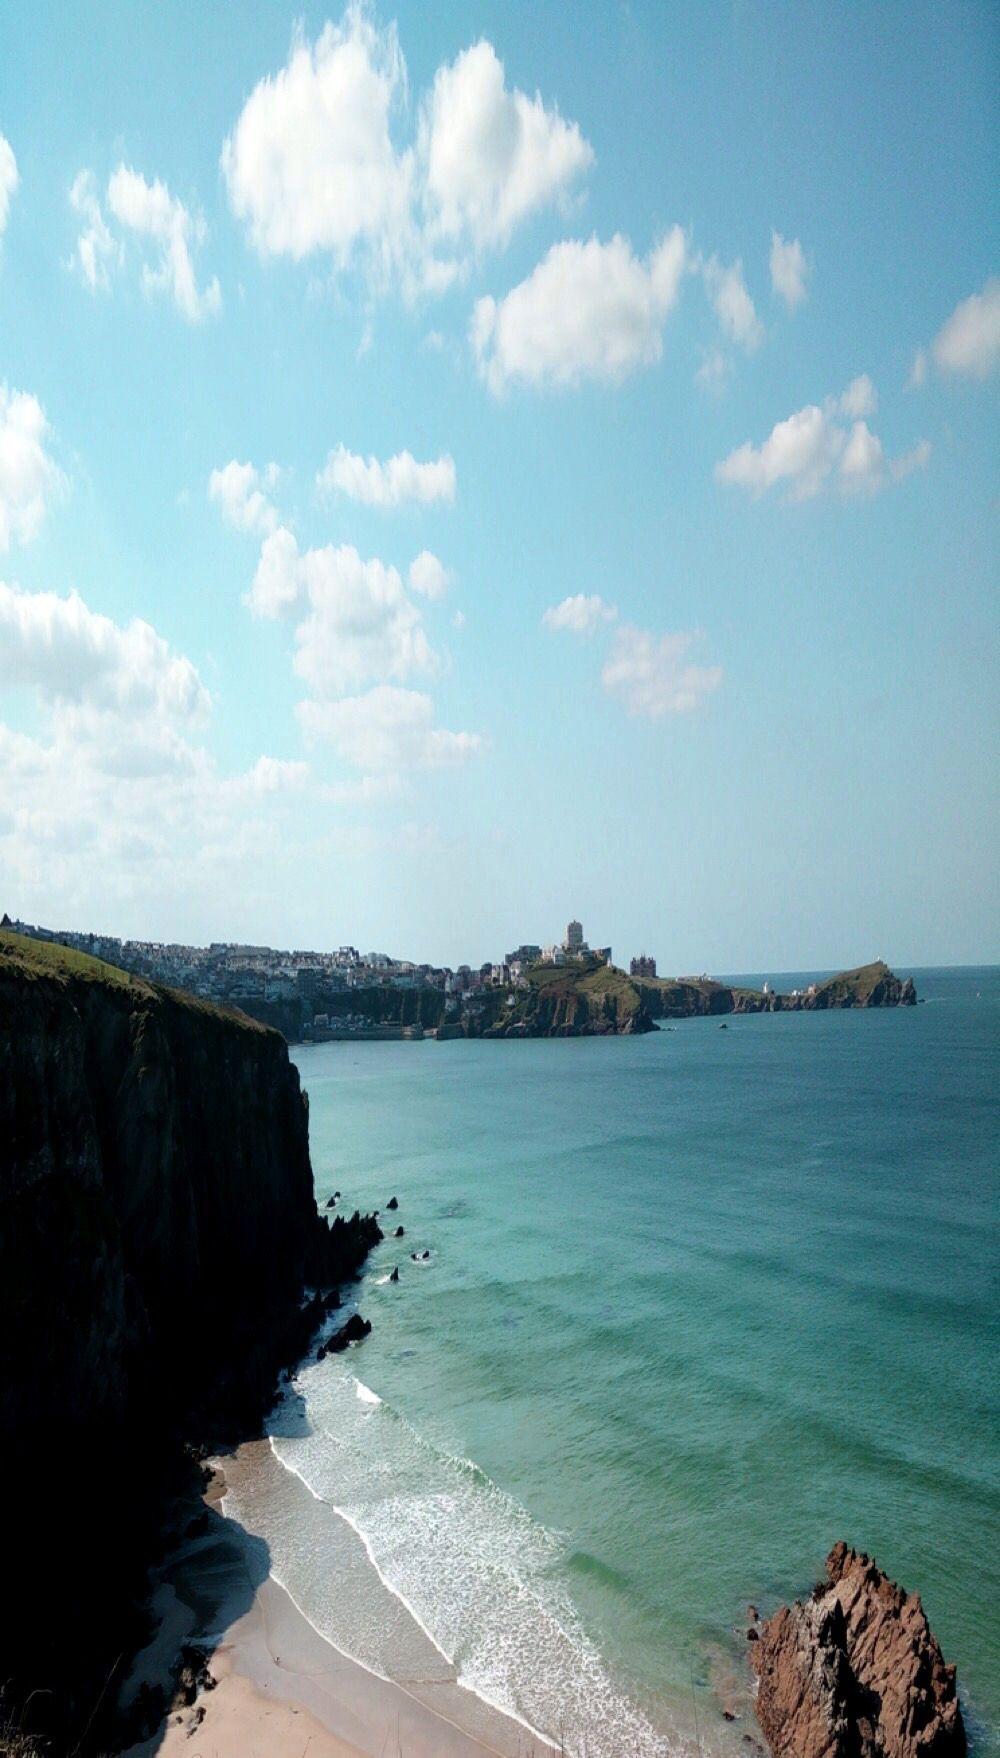 ocean, turquoise, sand, stones, beach, apple, wallpaper, iphone